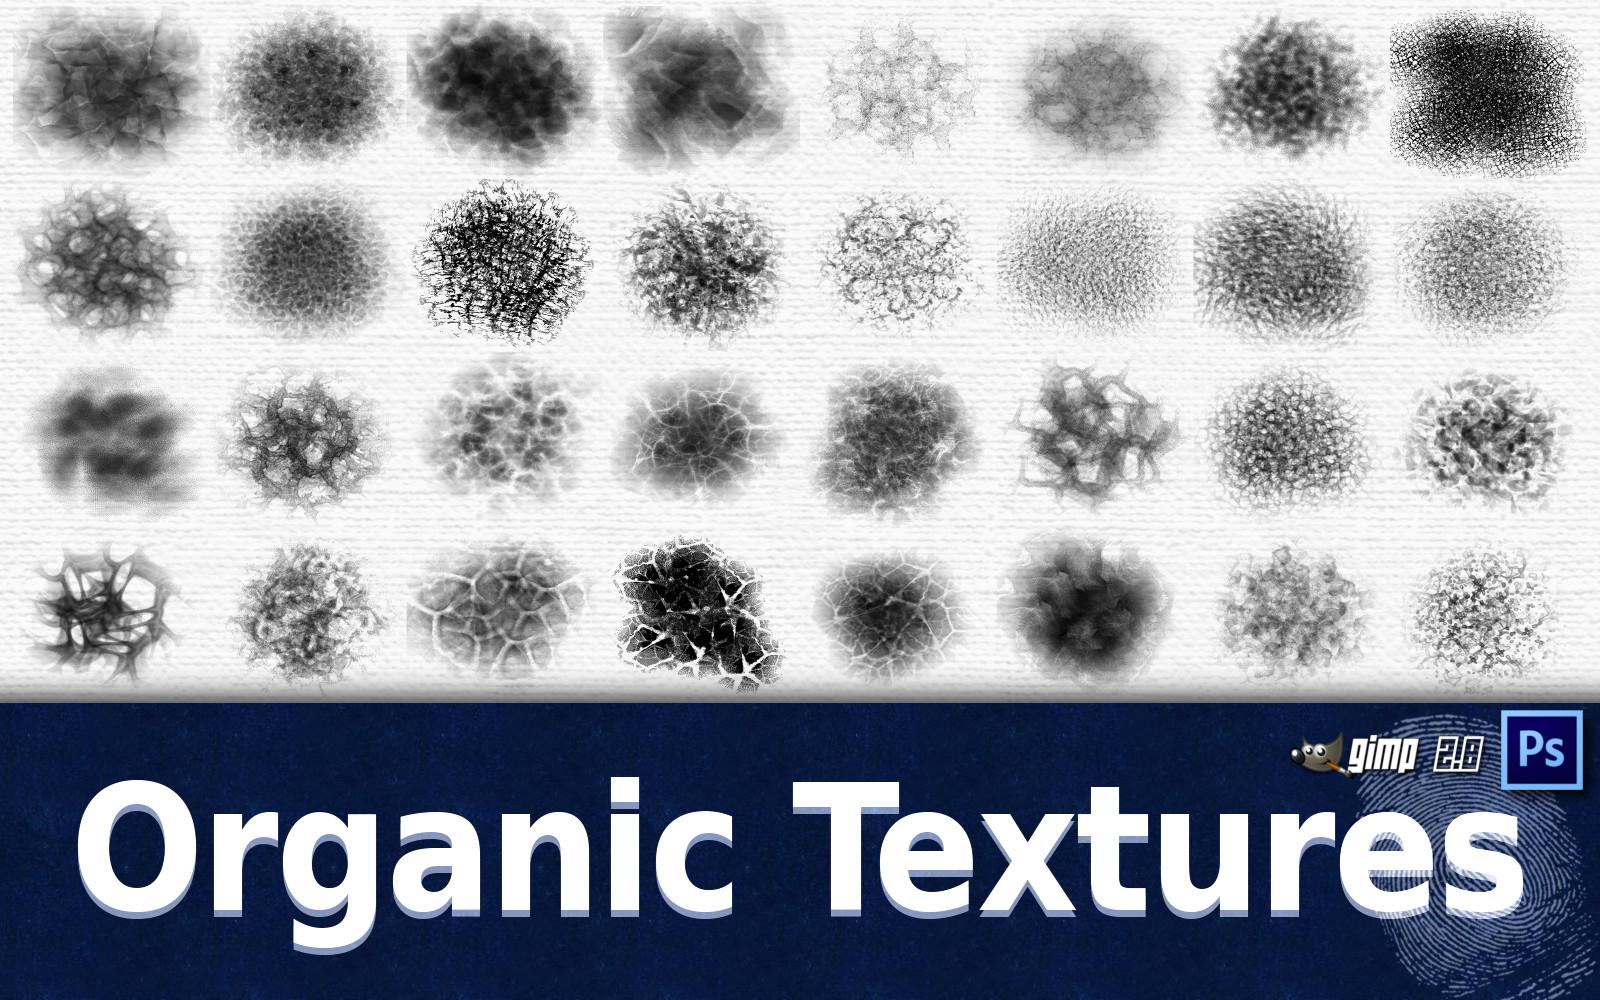 Organic Textures By GrindGod On DeviantArt